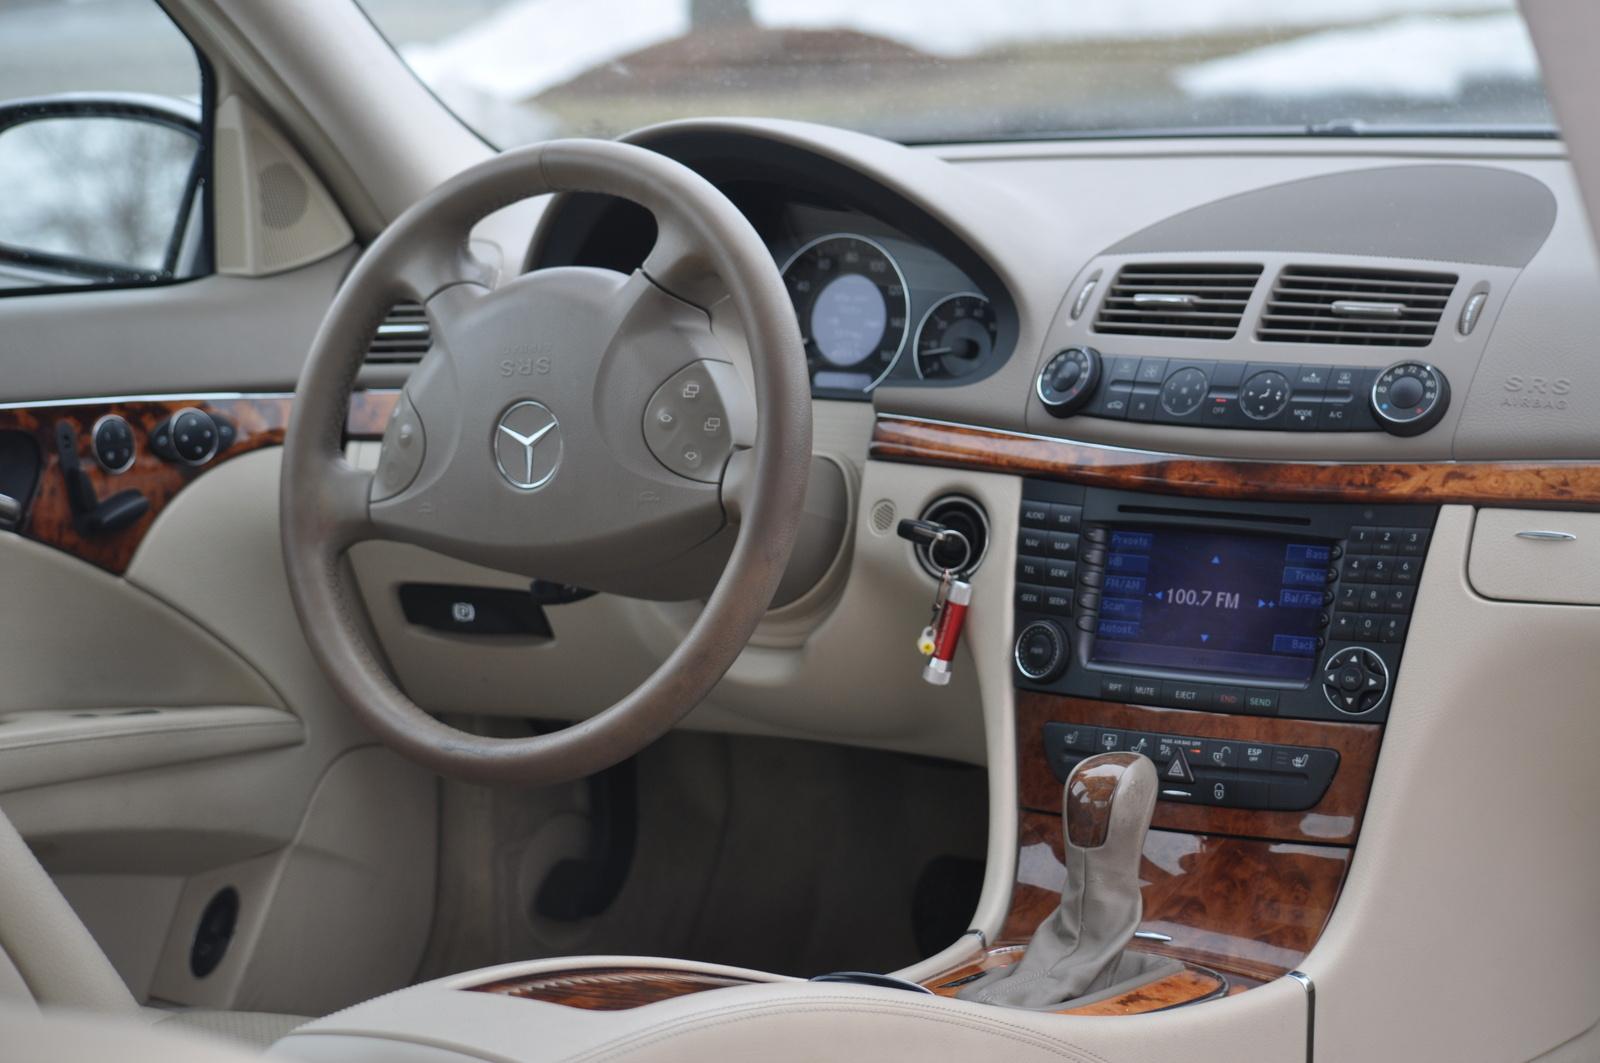 2006 Mercedes Benz E Class Interior Pictures Cargurus